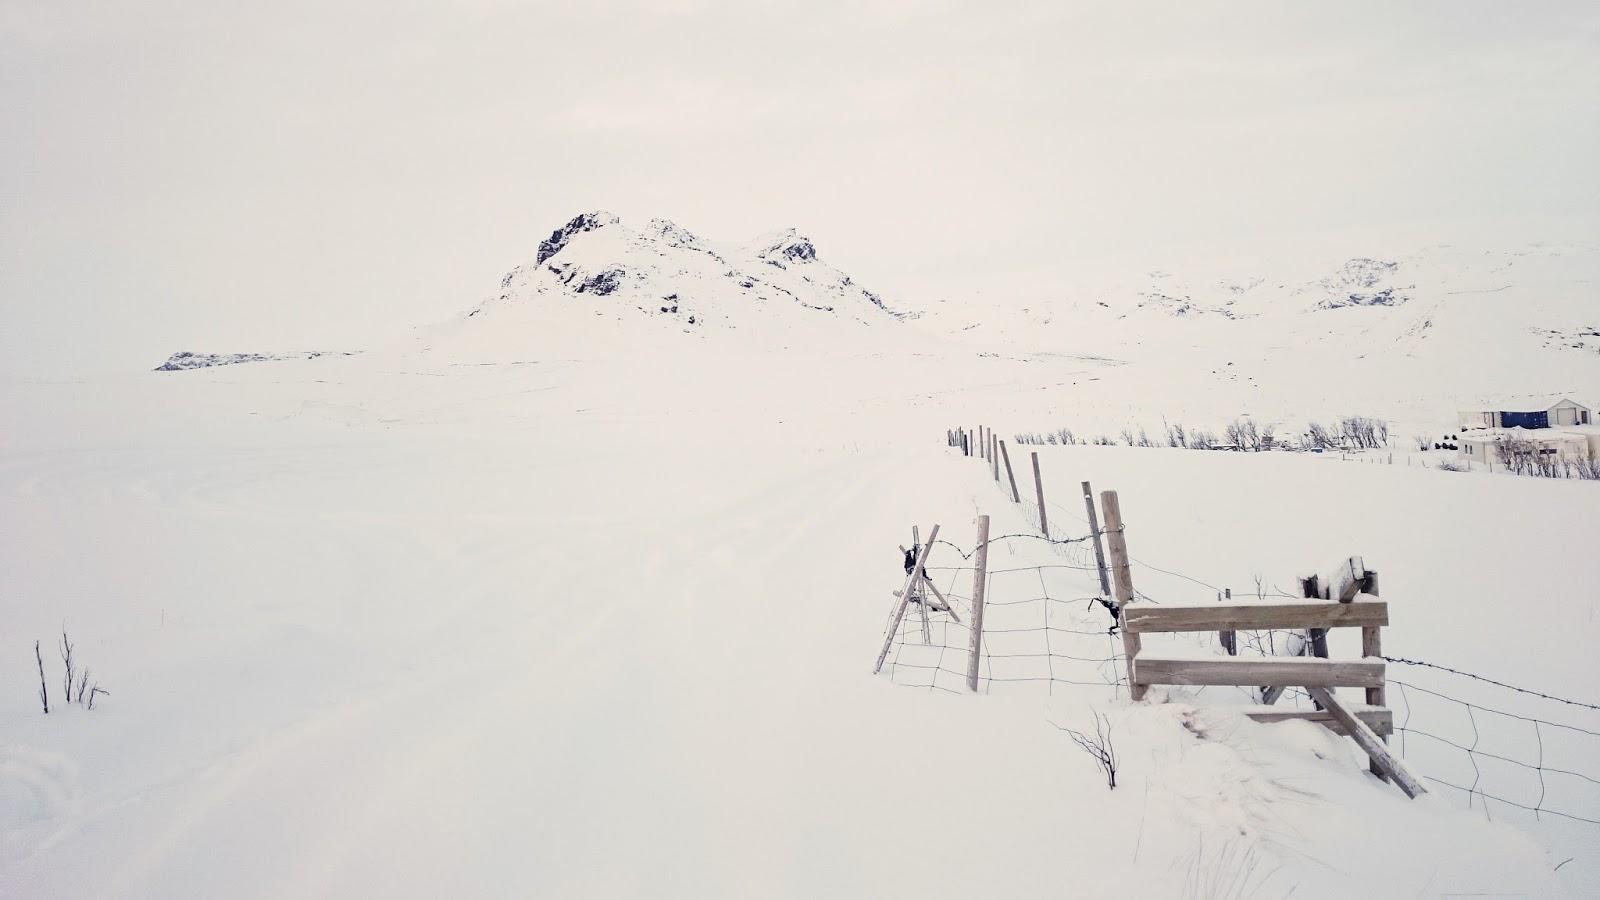 islandzka zima, zima w Islandii, Islandia, Islandia zdjęcia